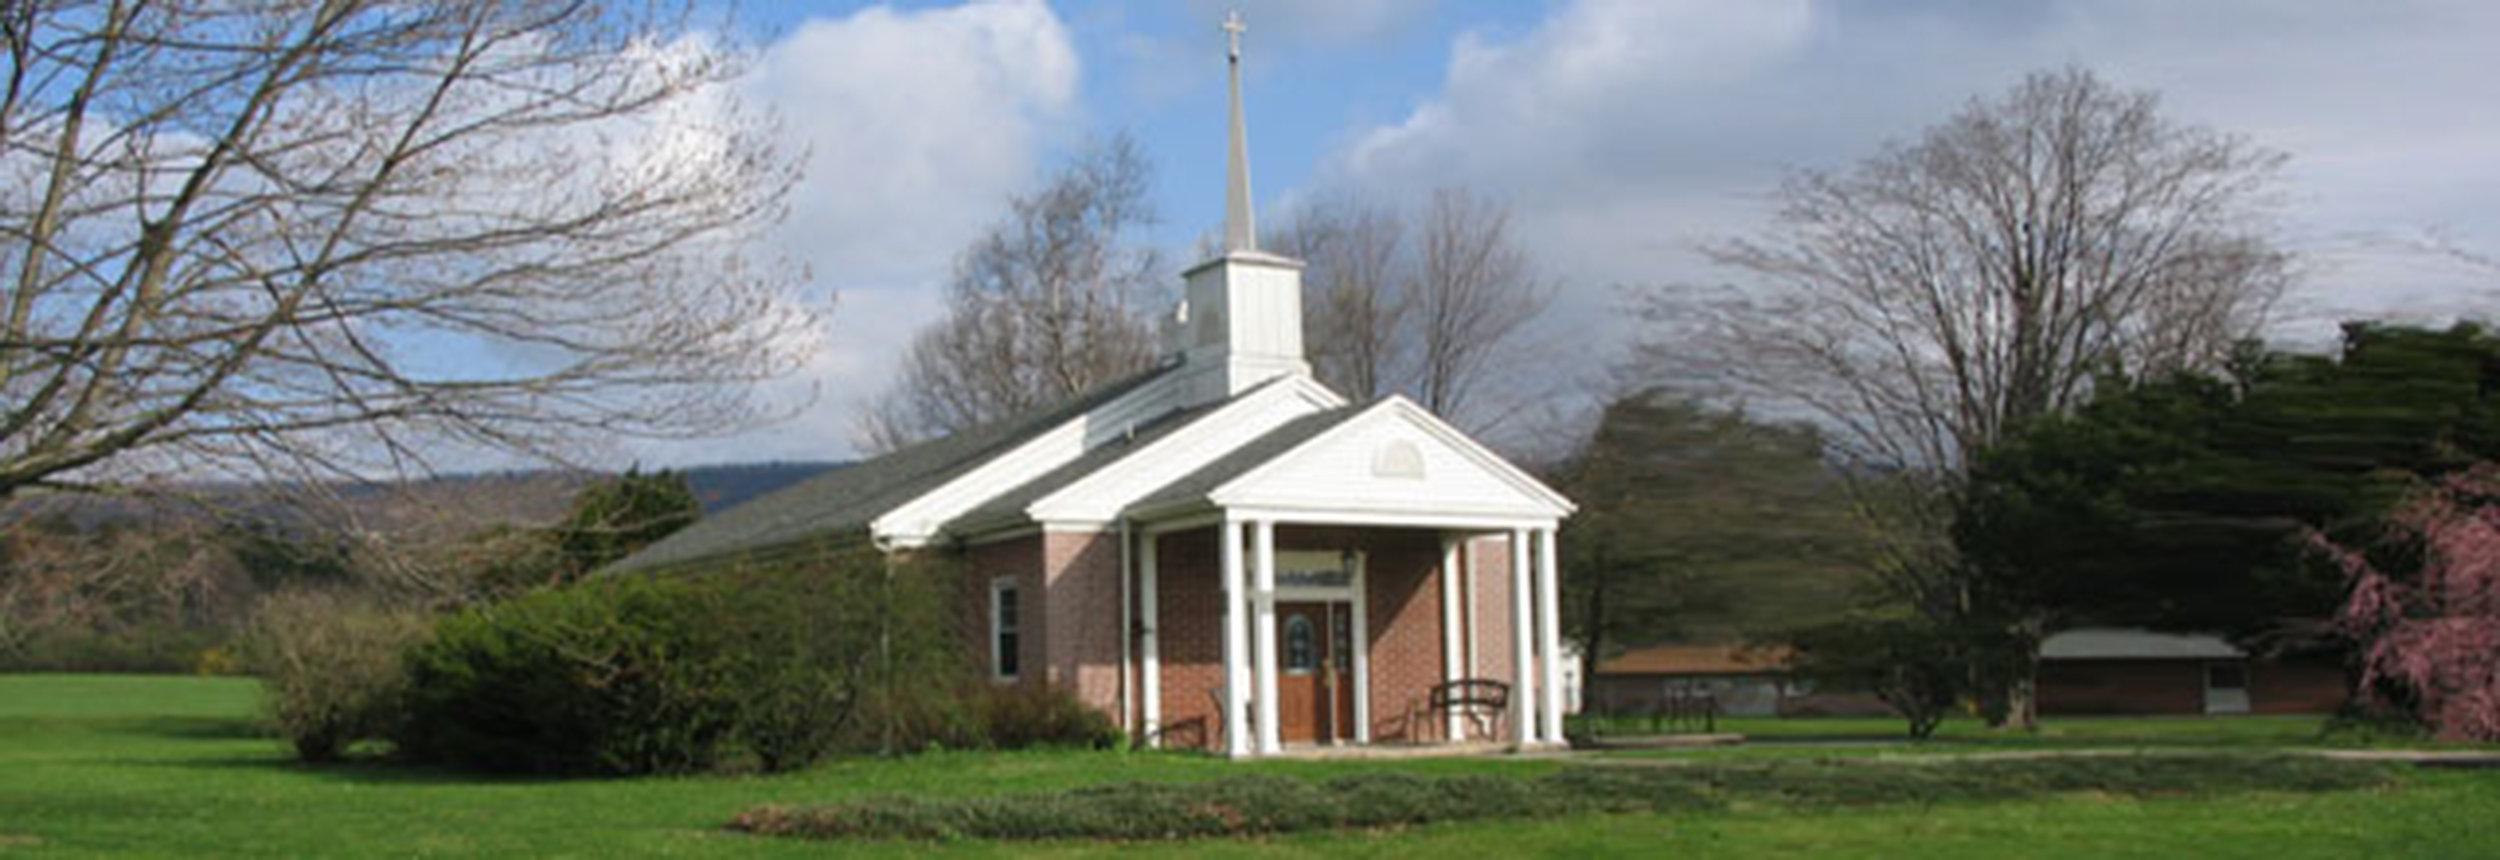 building_chapel.jpg